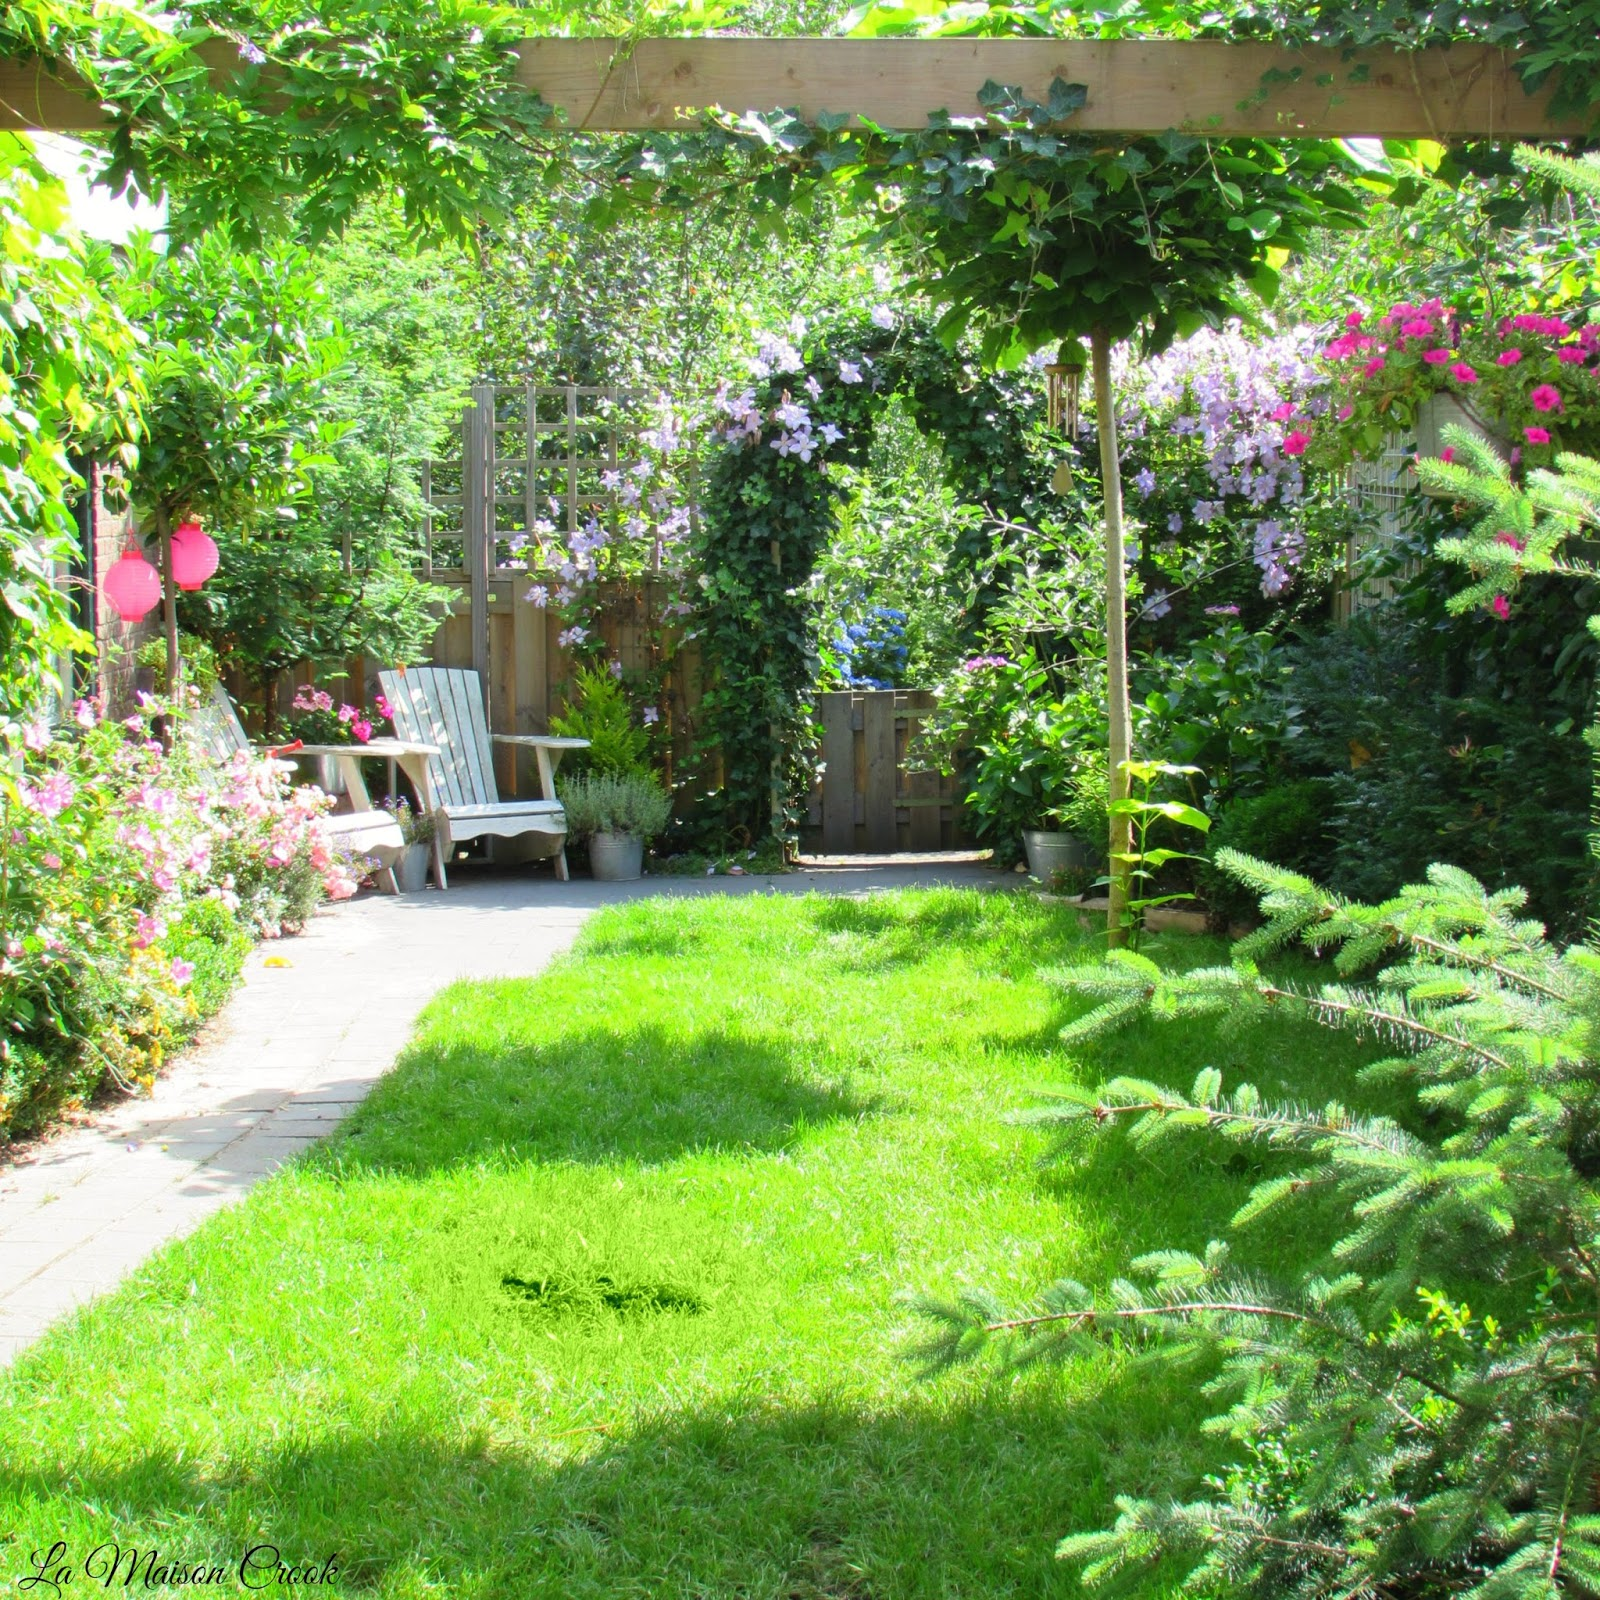 La maison crook: woonkamer en tuin 2015 / livingroom and garden 2015